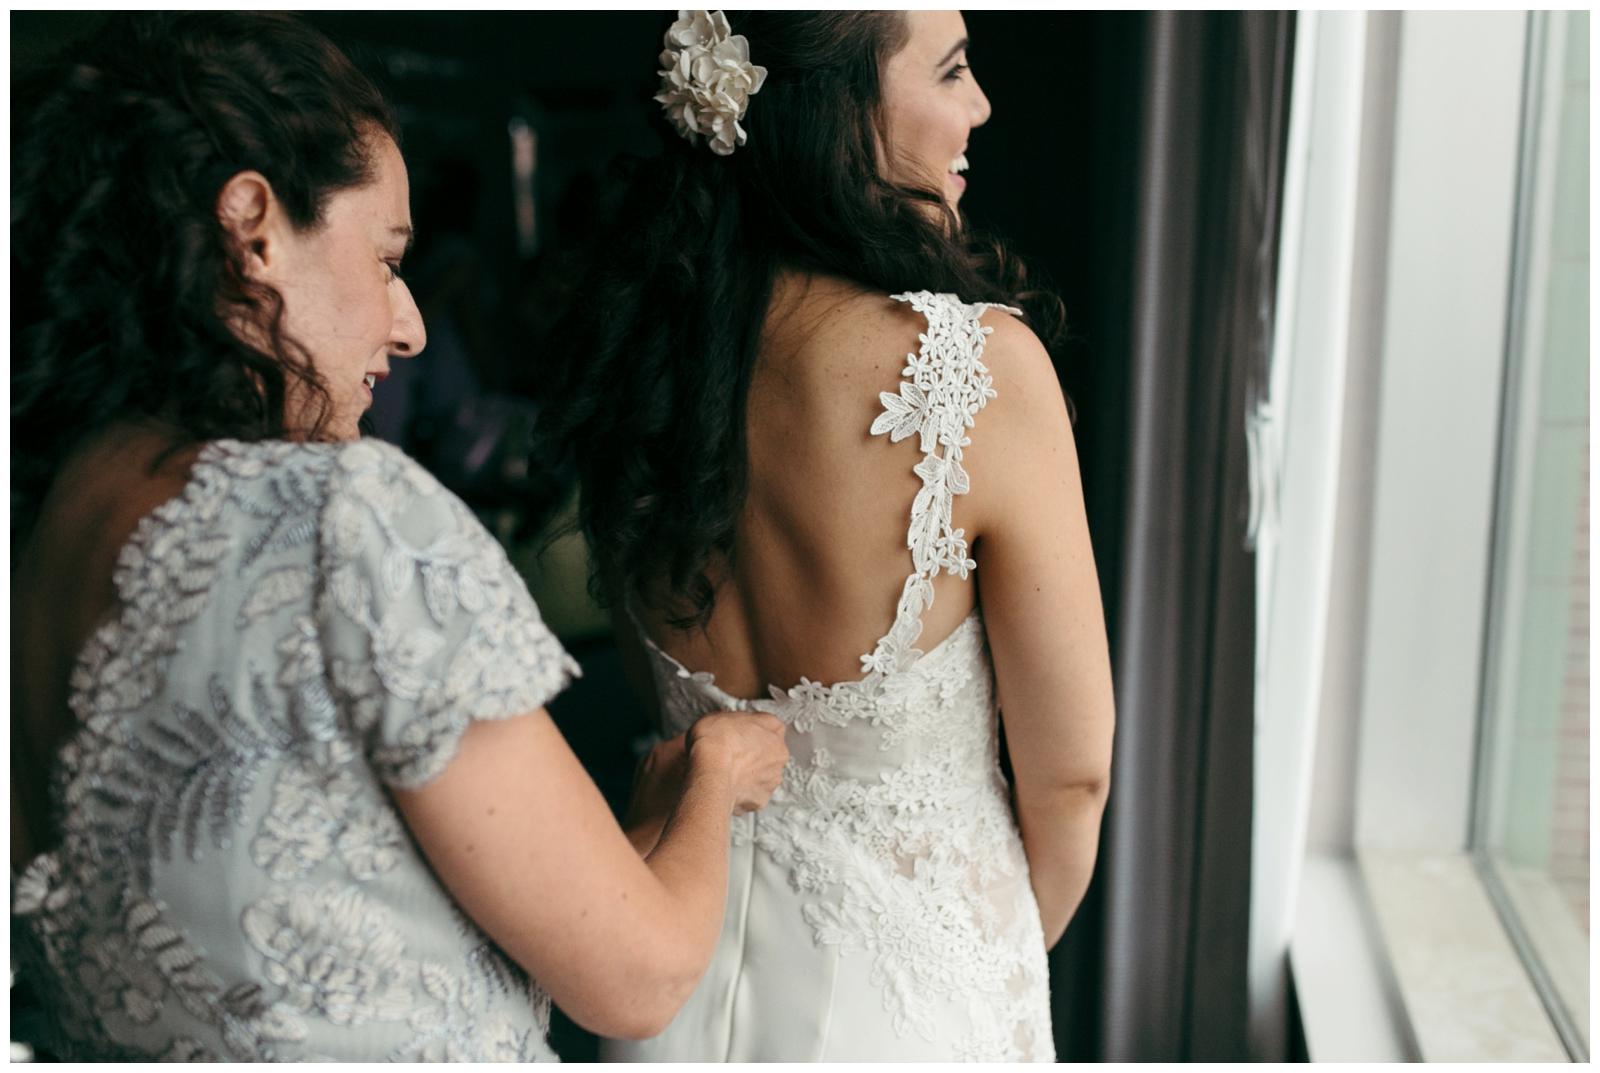 Bailey-Q-Photo-Royal-Sonesta-Boston-Wedding-Photographer-011.jpg